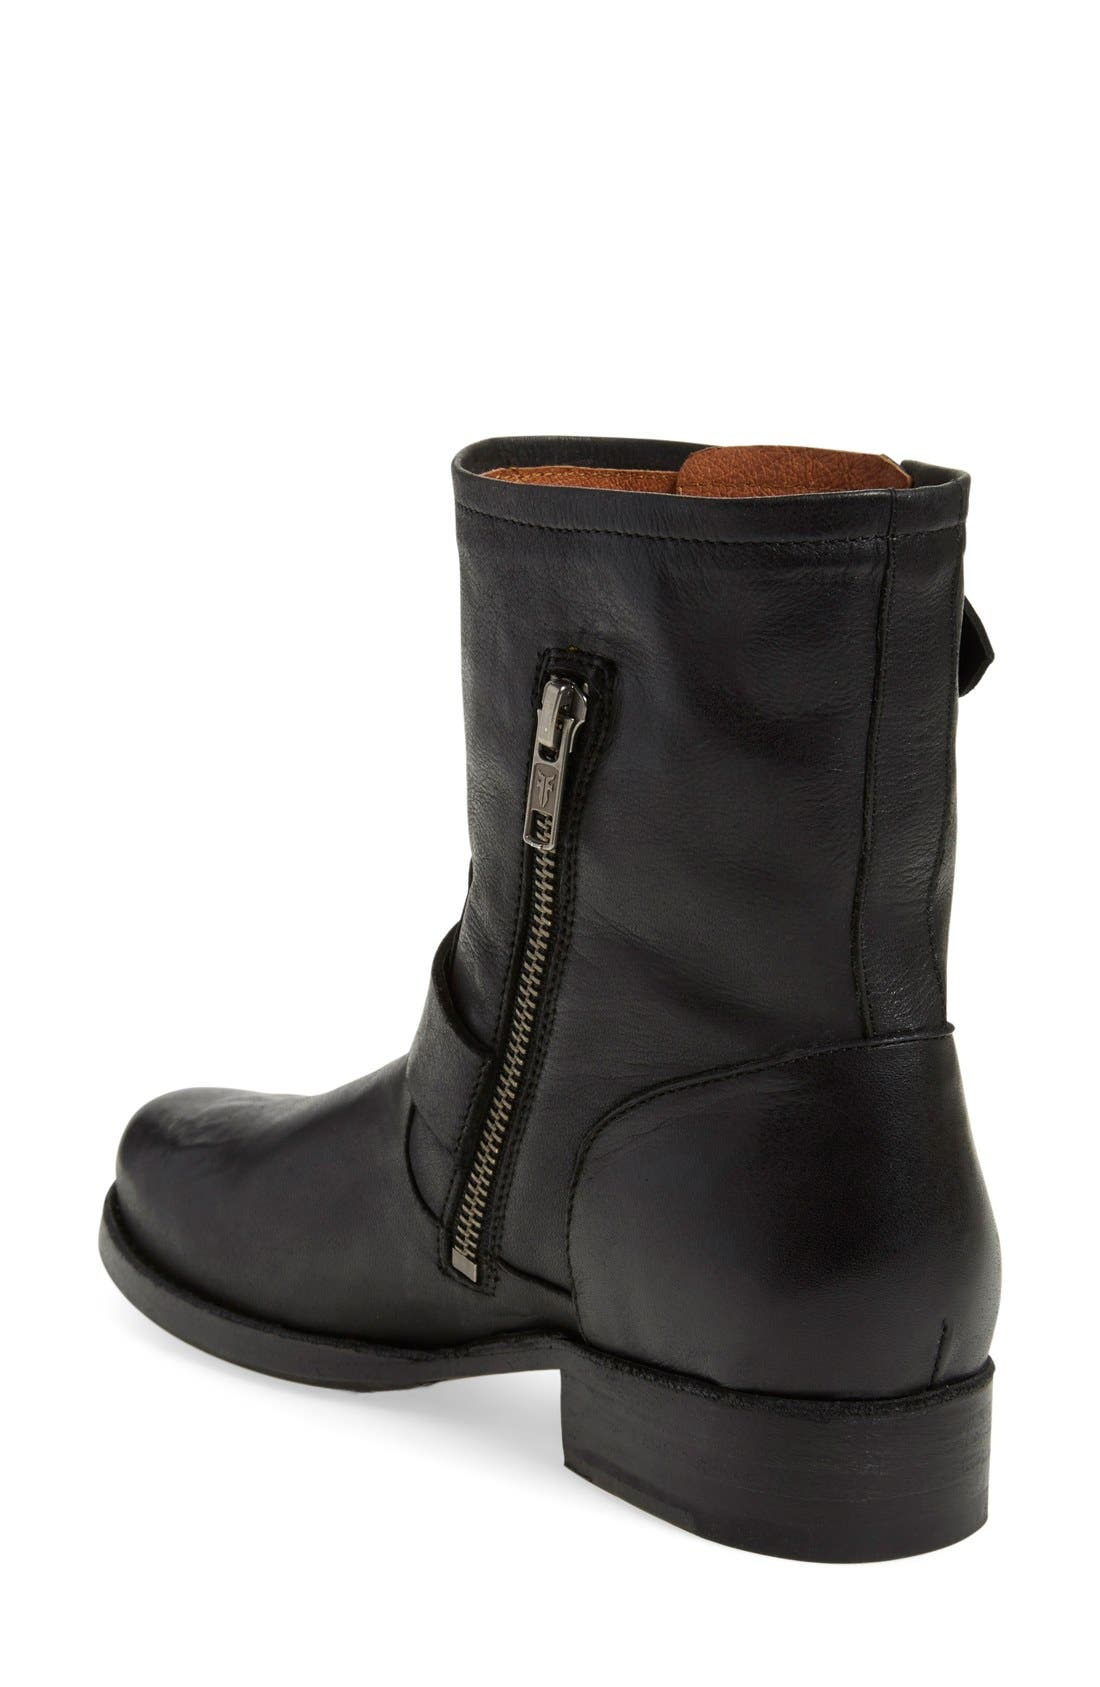 Alternate Image 3  - Frye 'Vicky Engineer' Boot (Women)